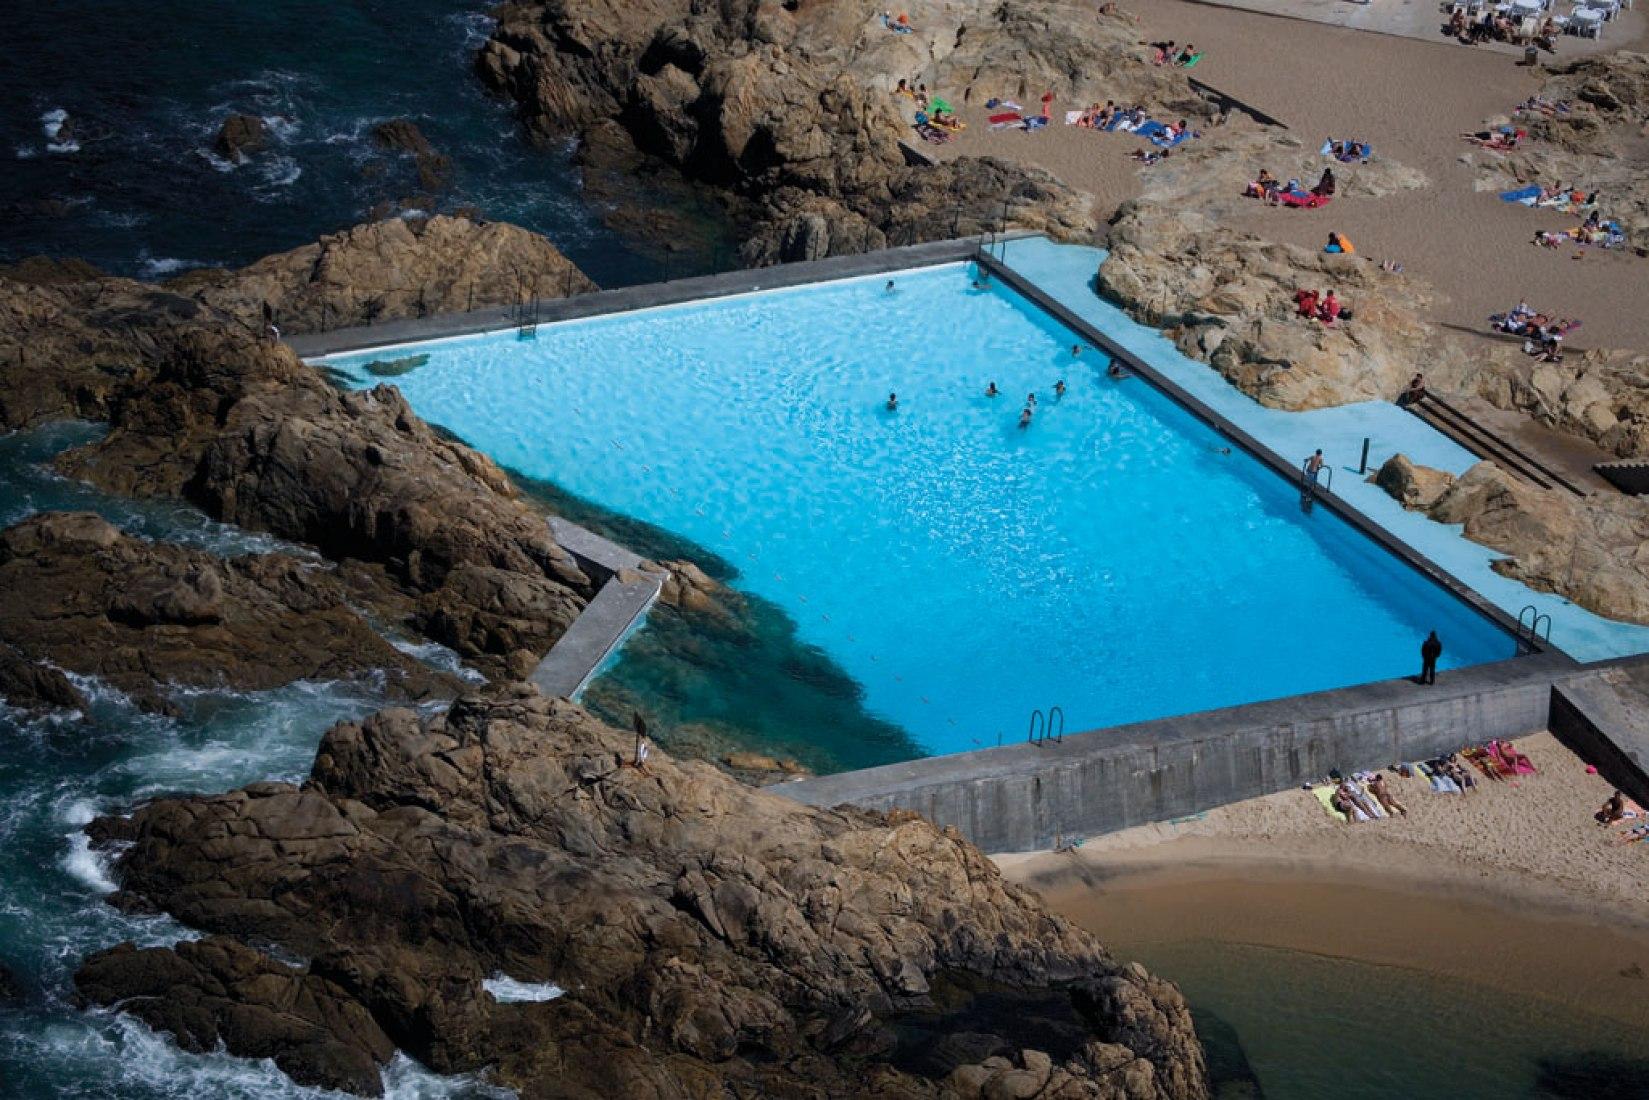 Pools in Leça da Palmeira, Portugal. Photography © FG+SG fotografia de arquitectura. Courtesy of TASCHEN.